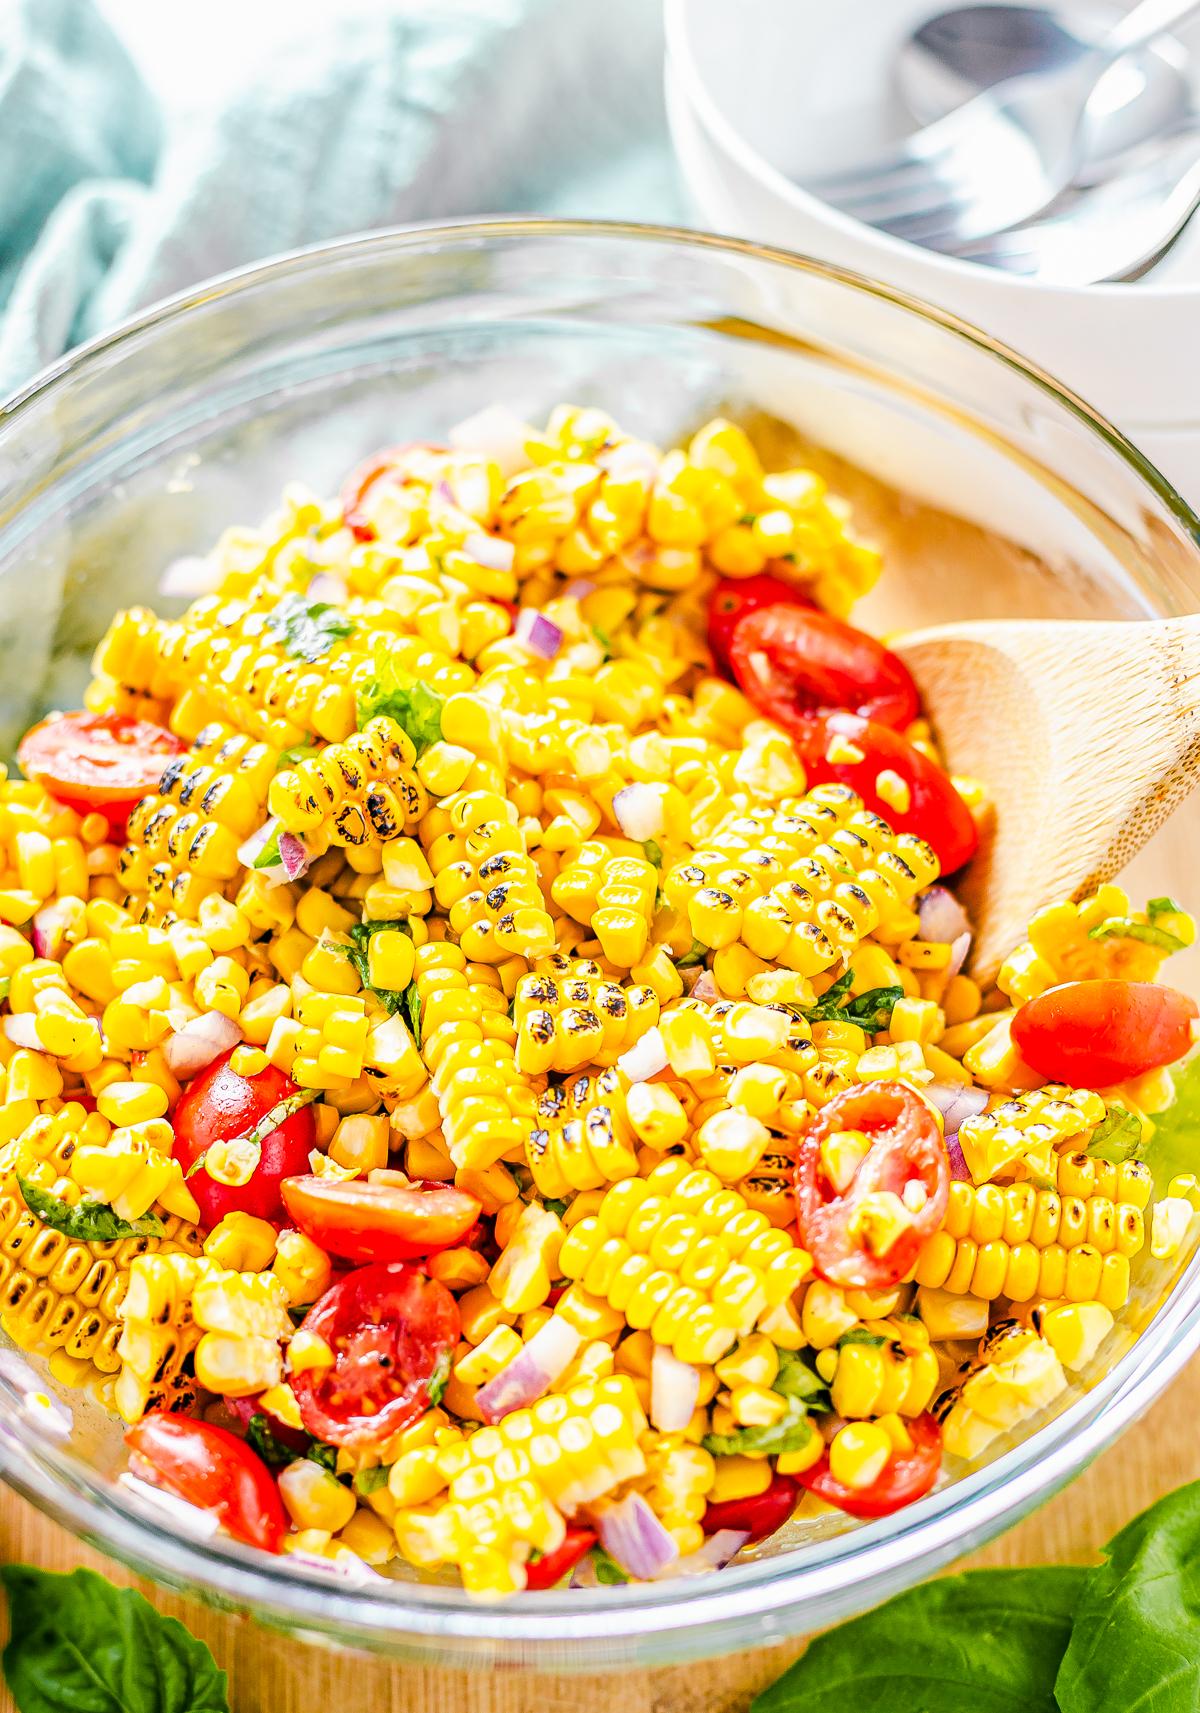 Spoon im bowl of salad